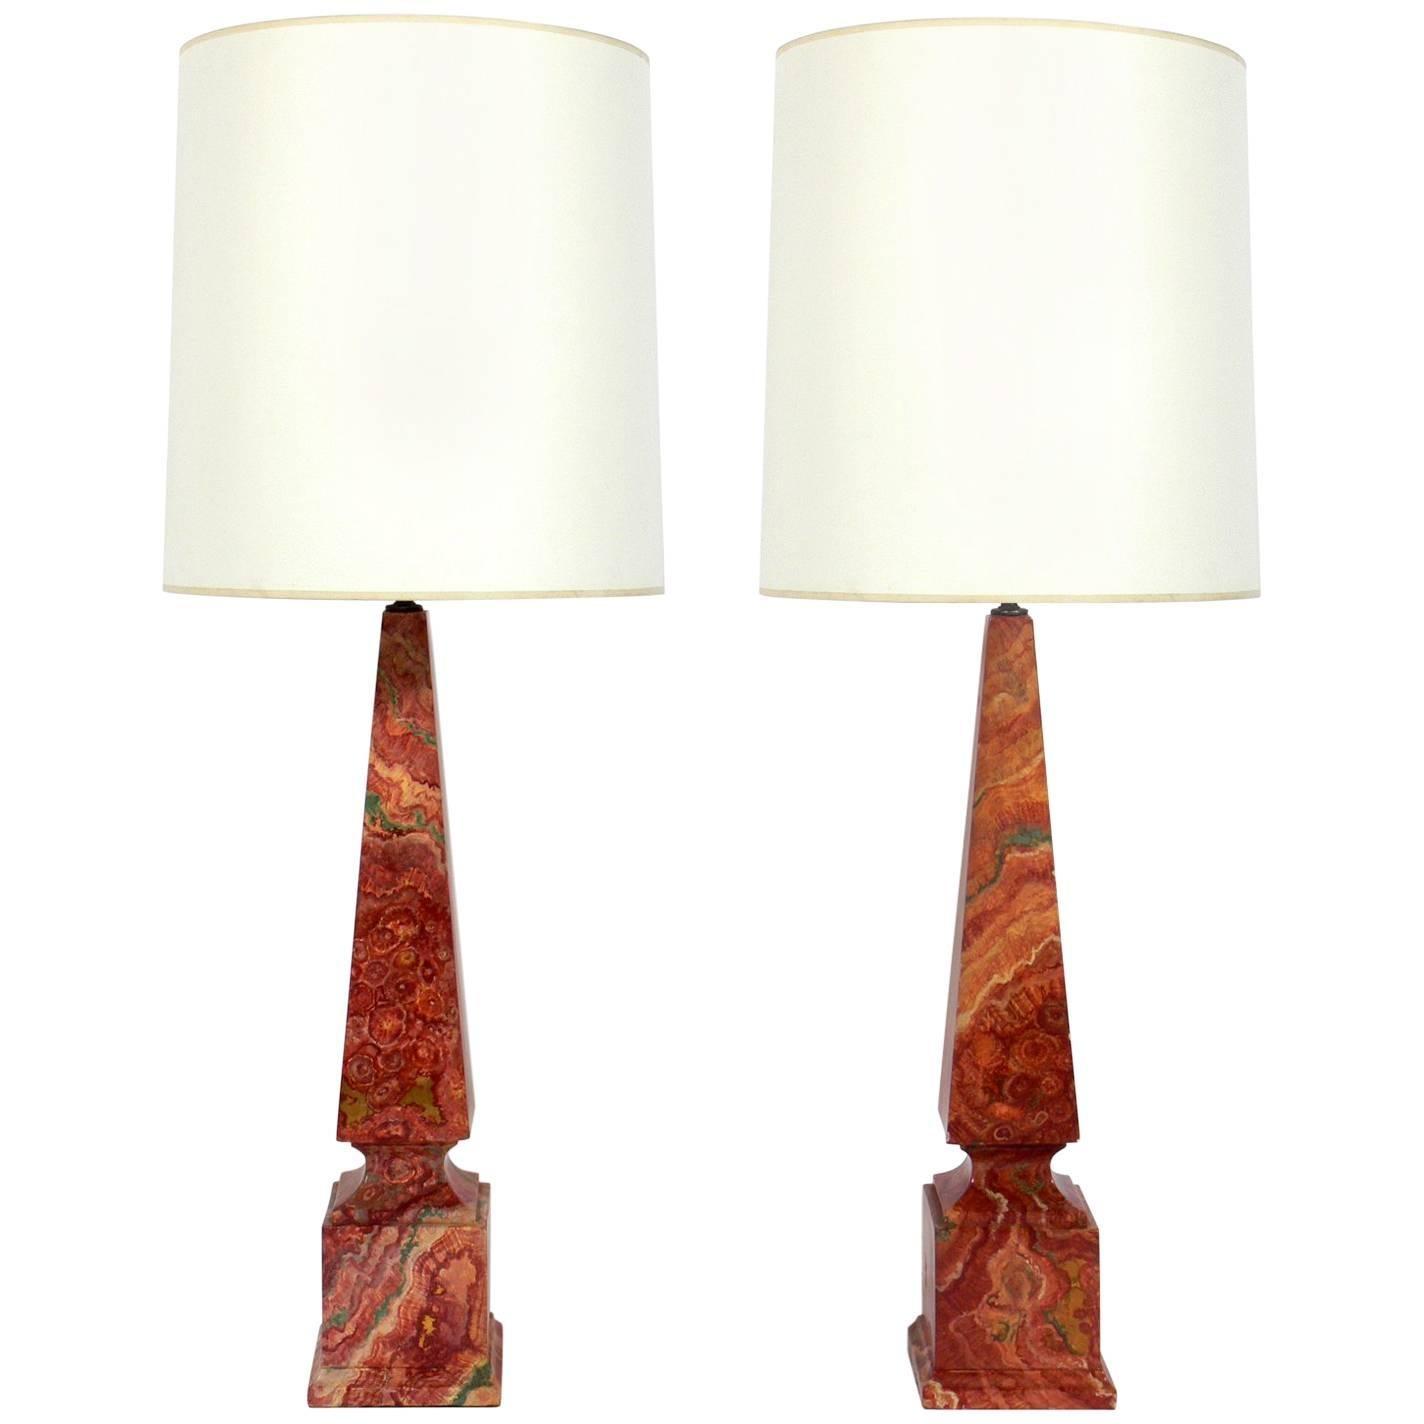 Pair of Faux Agate Obelisk Lamps